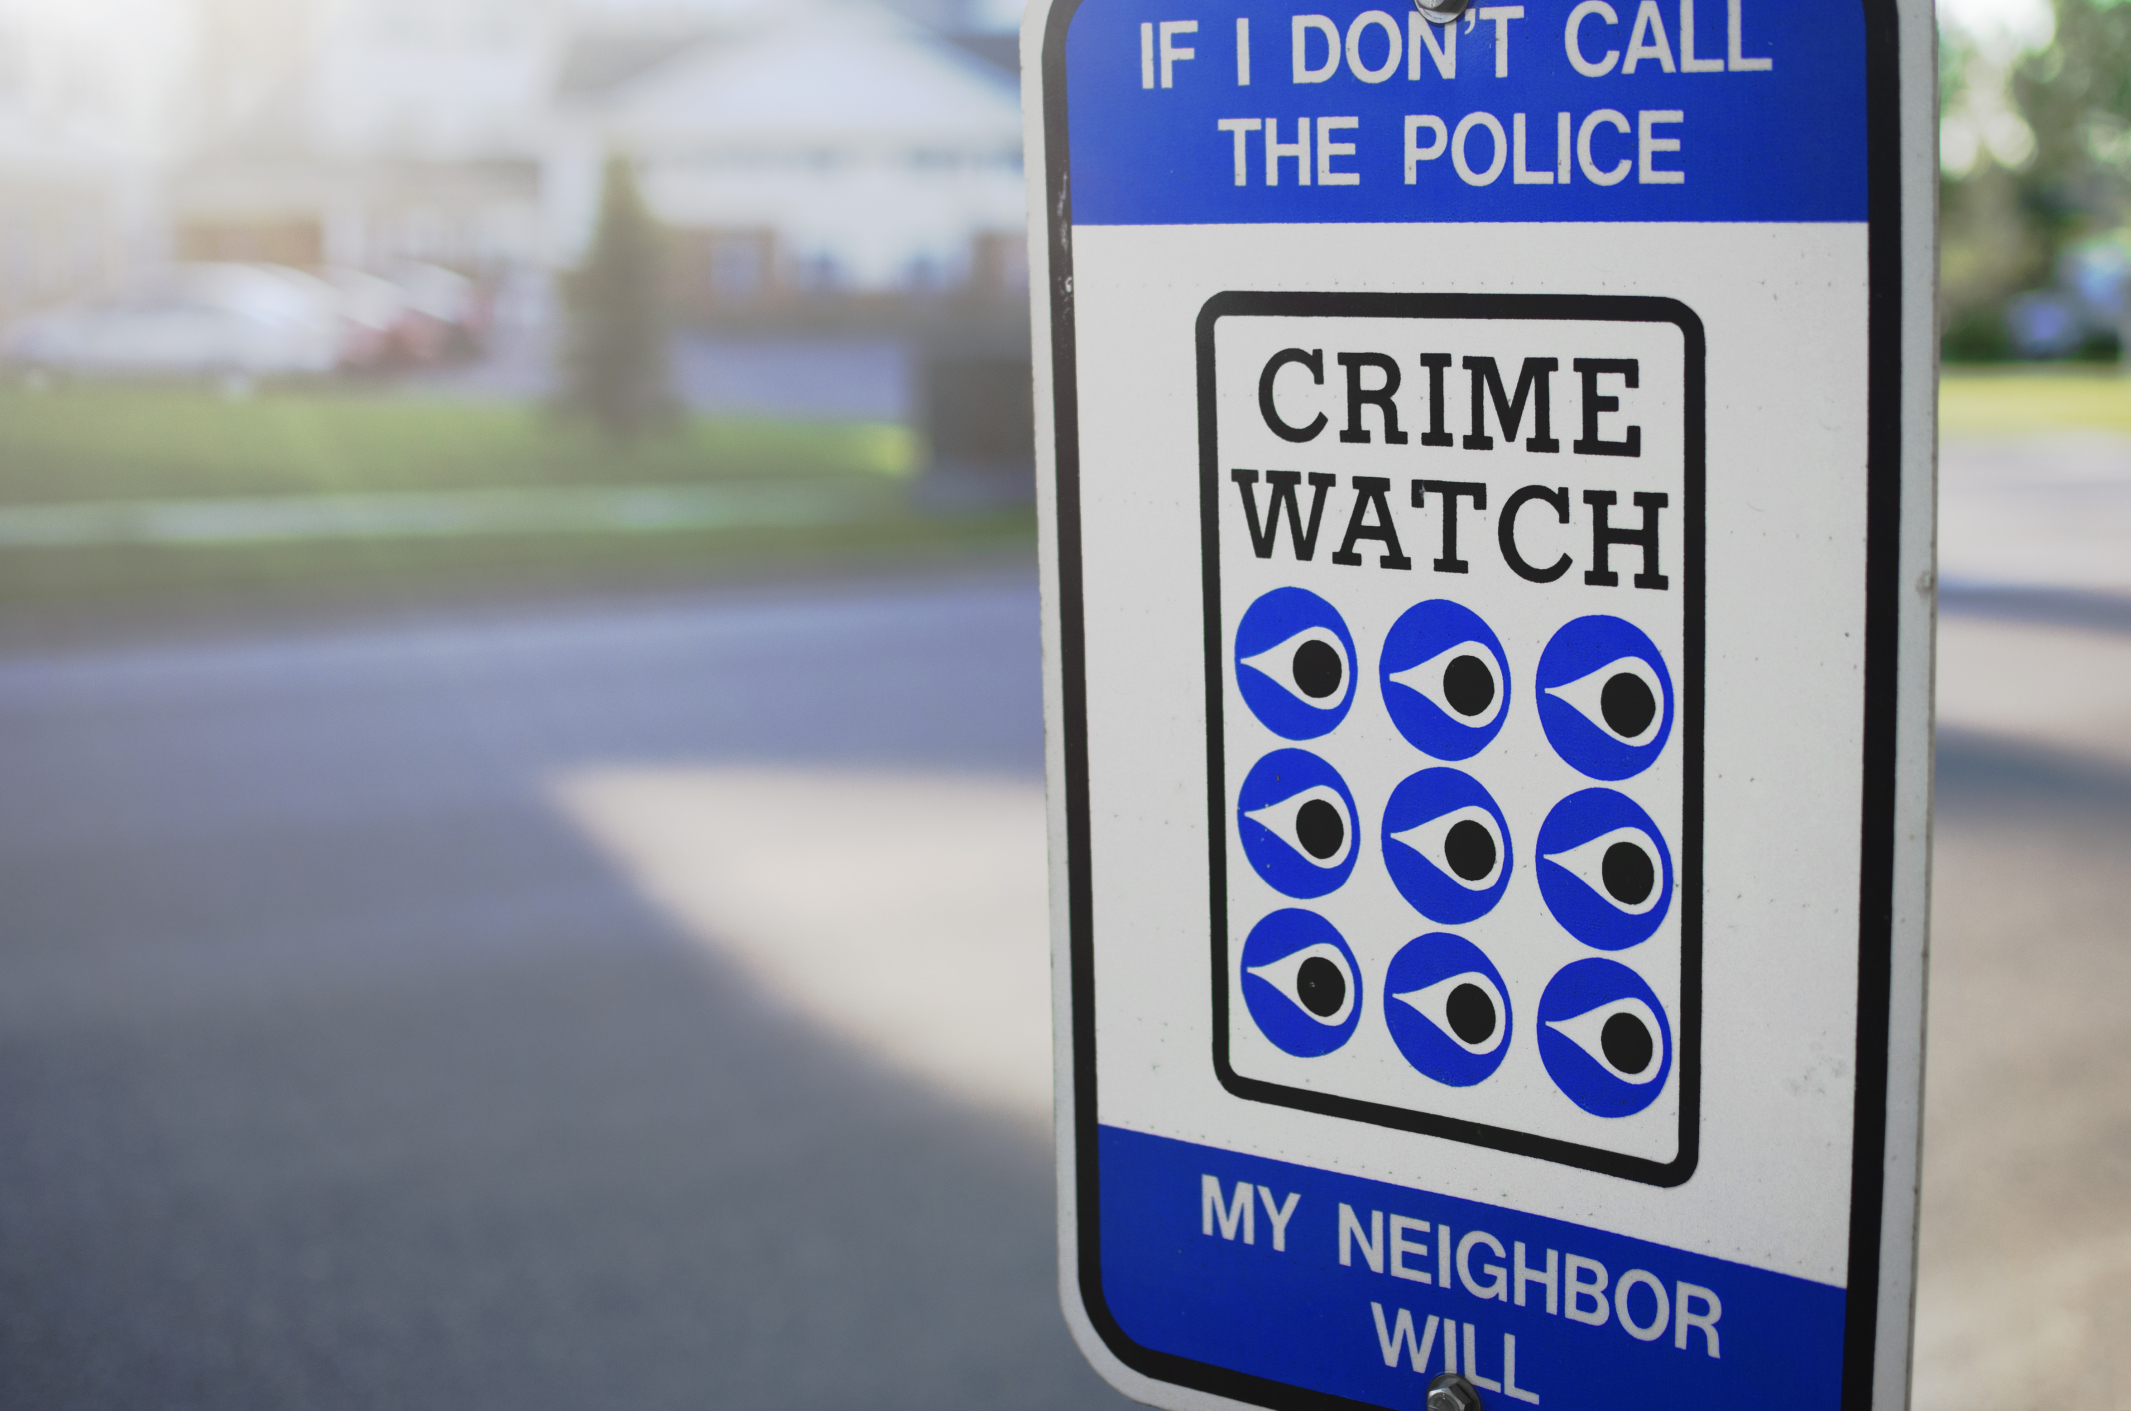 Prince William Co. Police to host Neighborhood Watch training